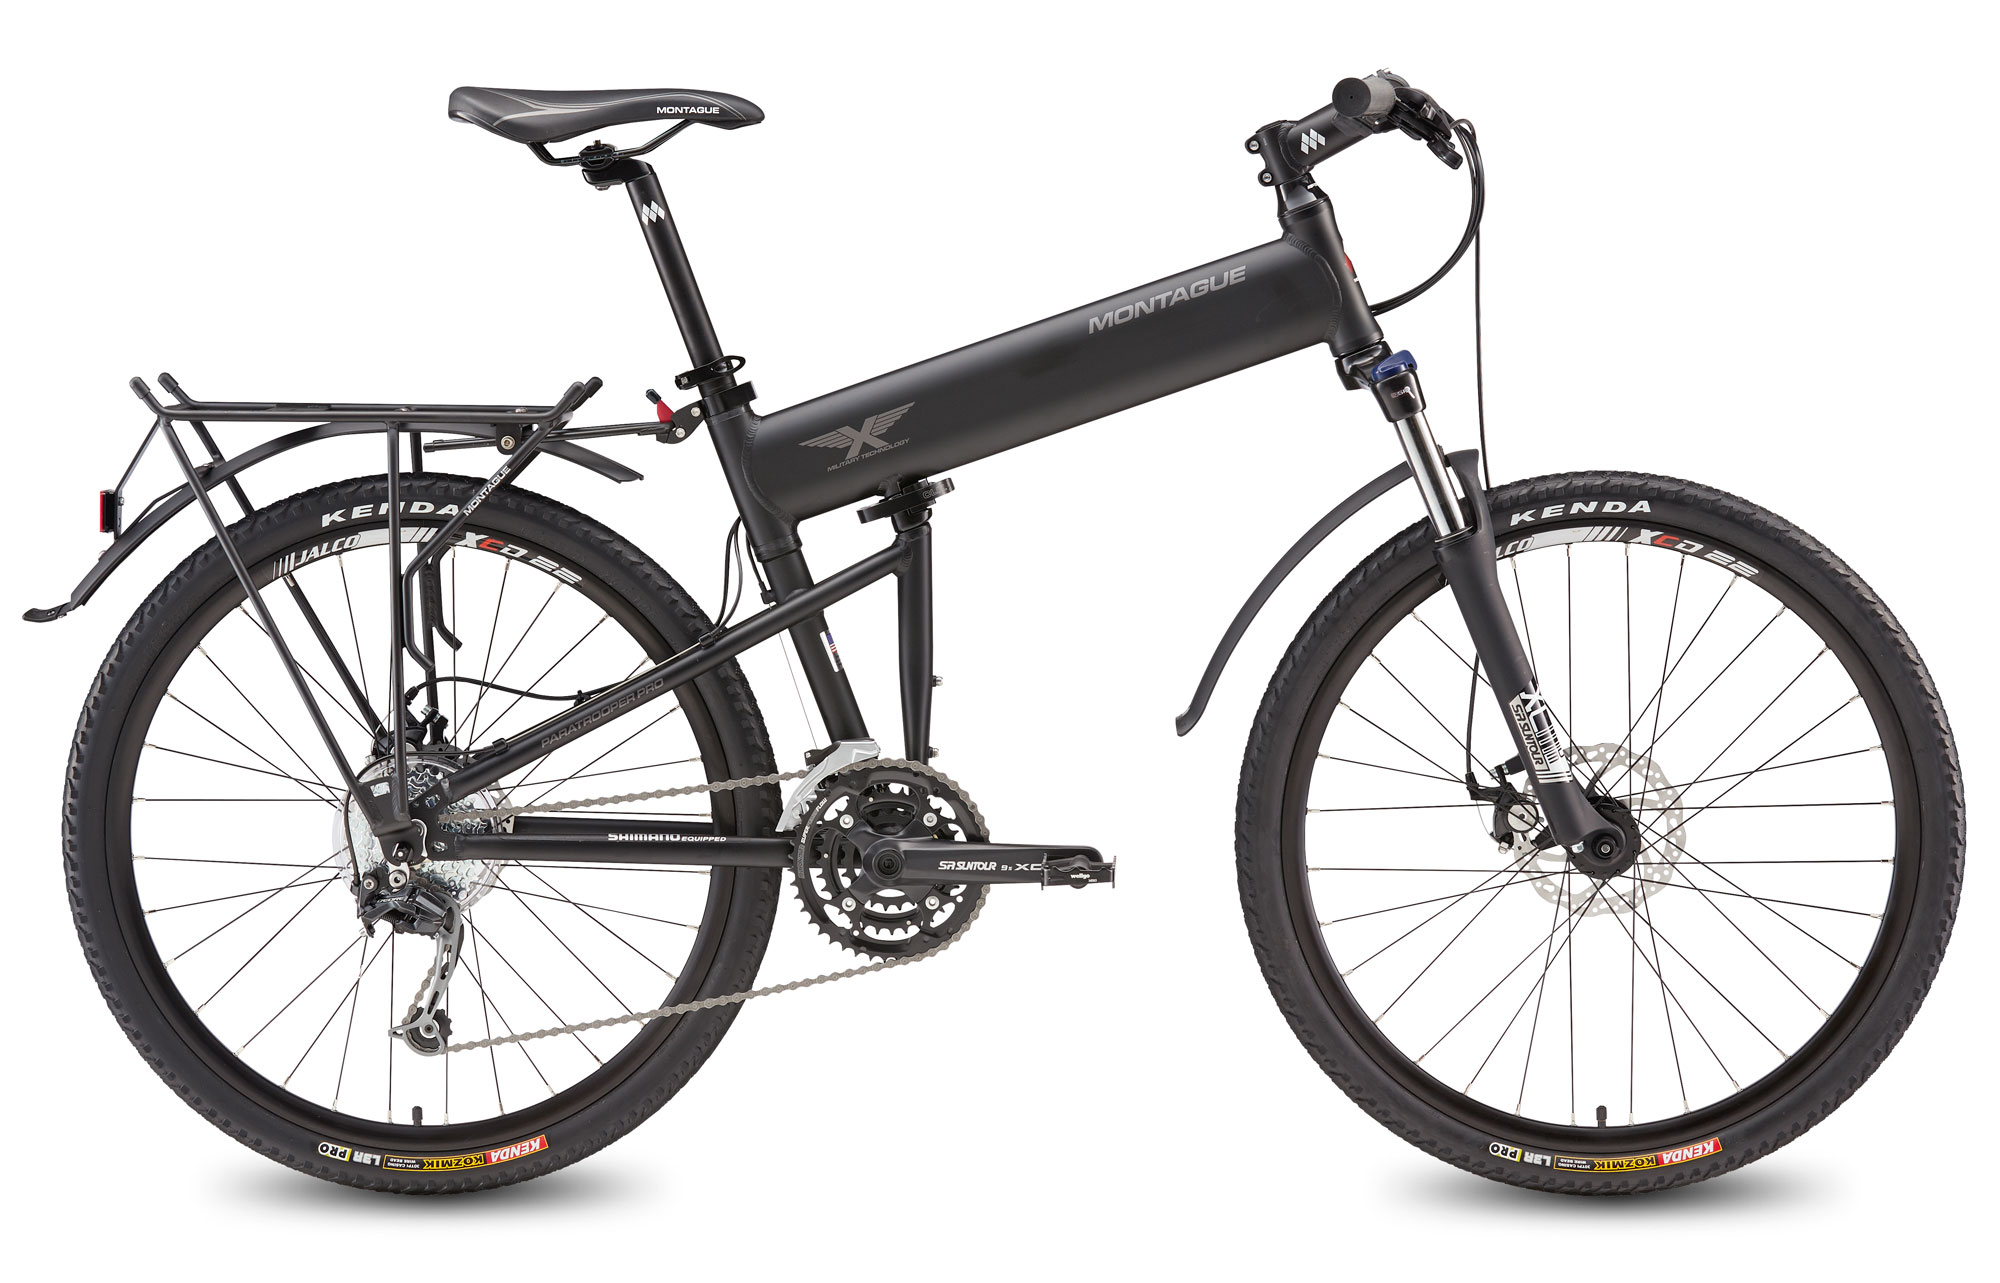 Paratrooper Pro DirectConnect Mountain Folding Bike